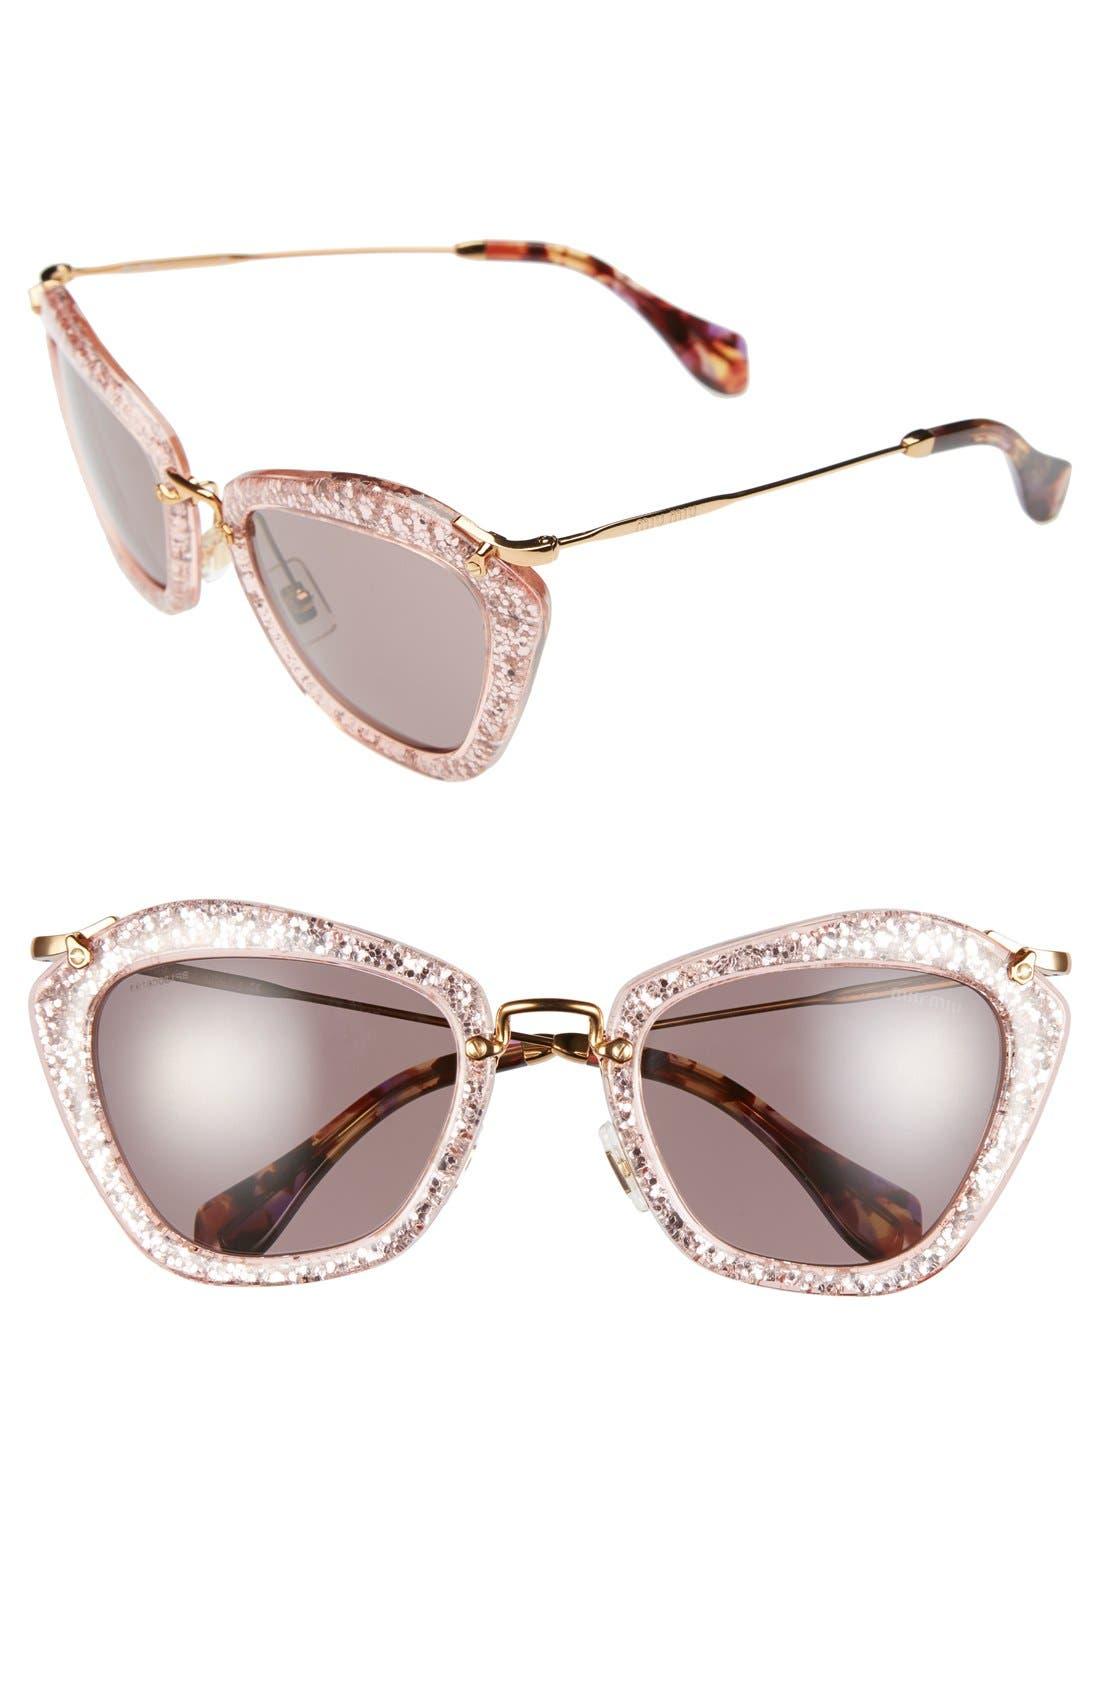 Alternate Image 1 Selected - Miu Miu 55mm Sunglasses